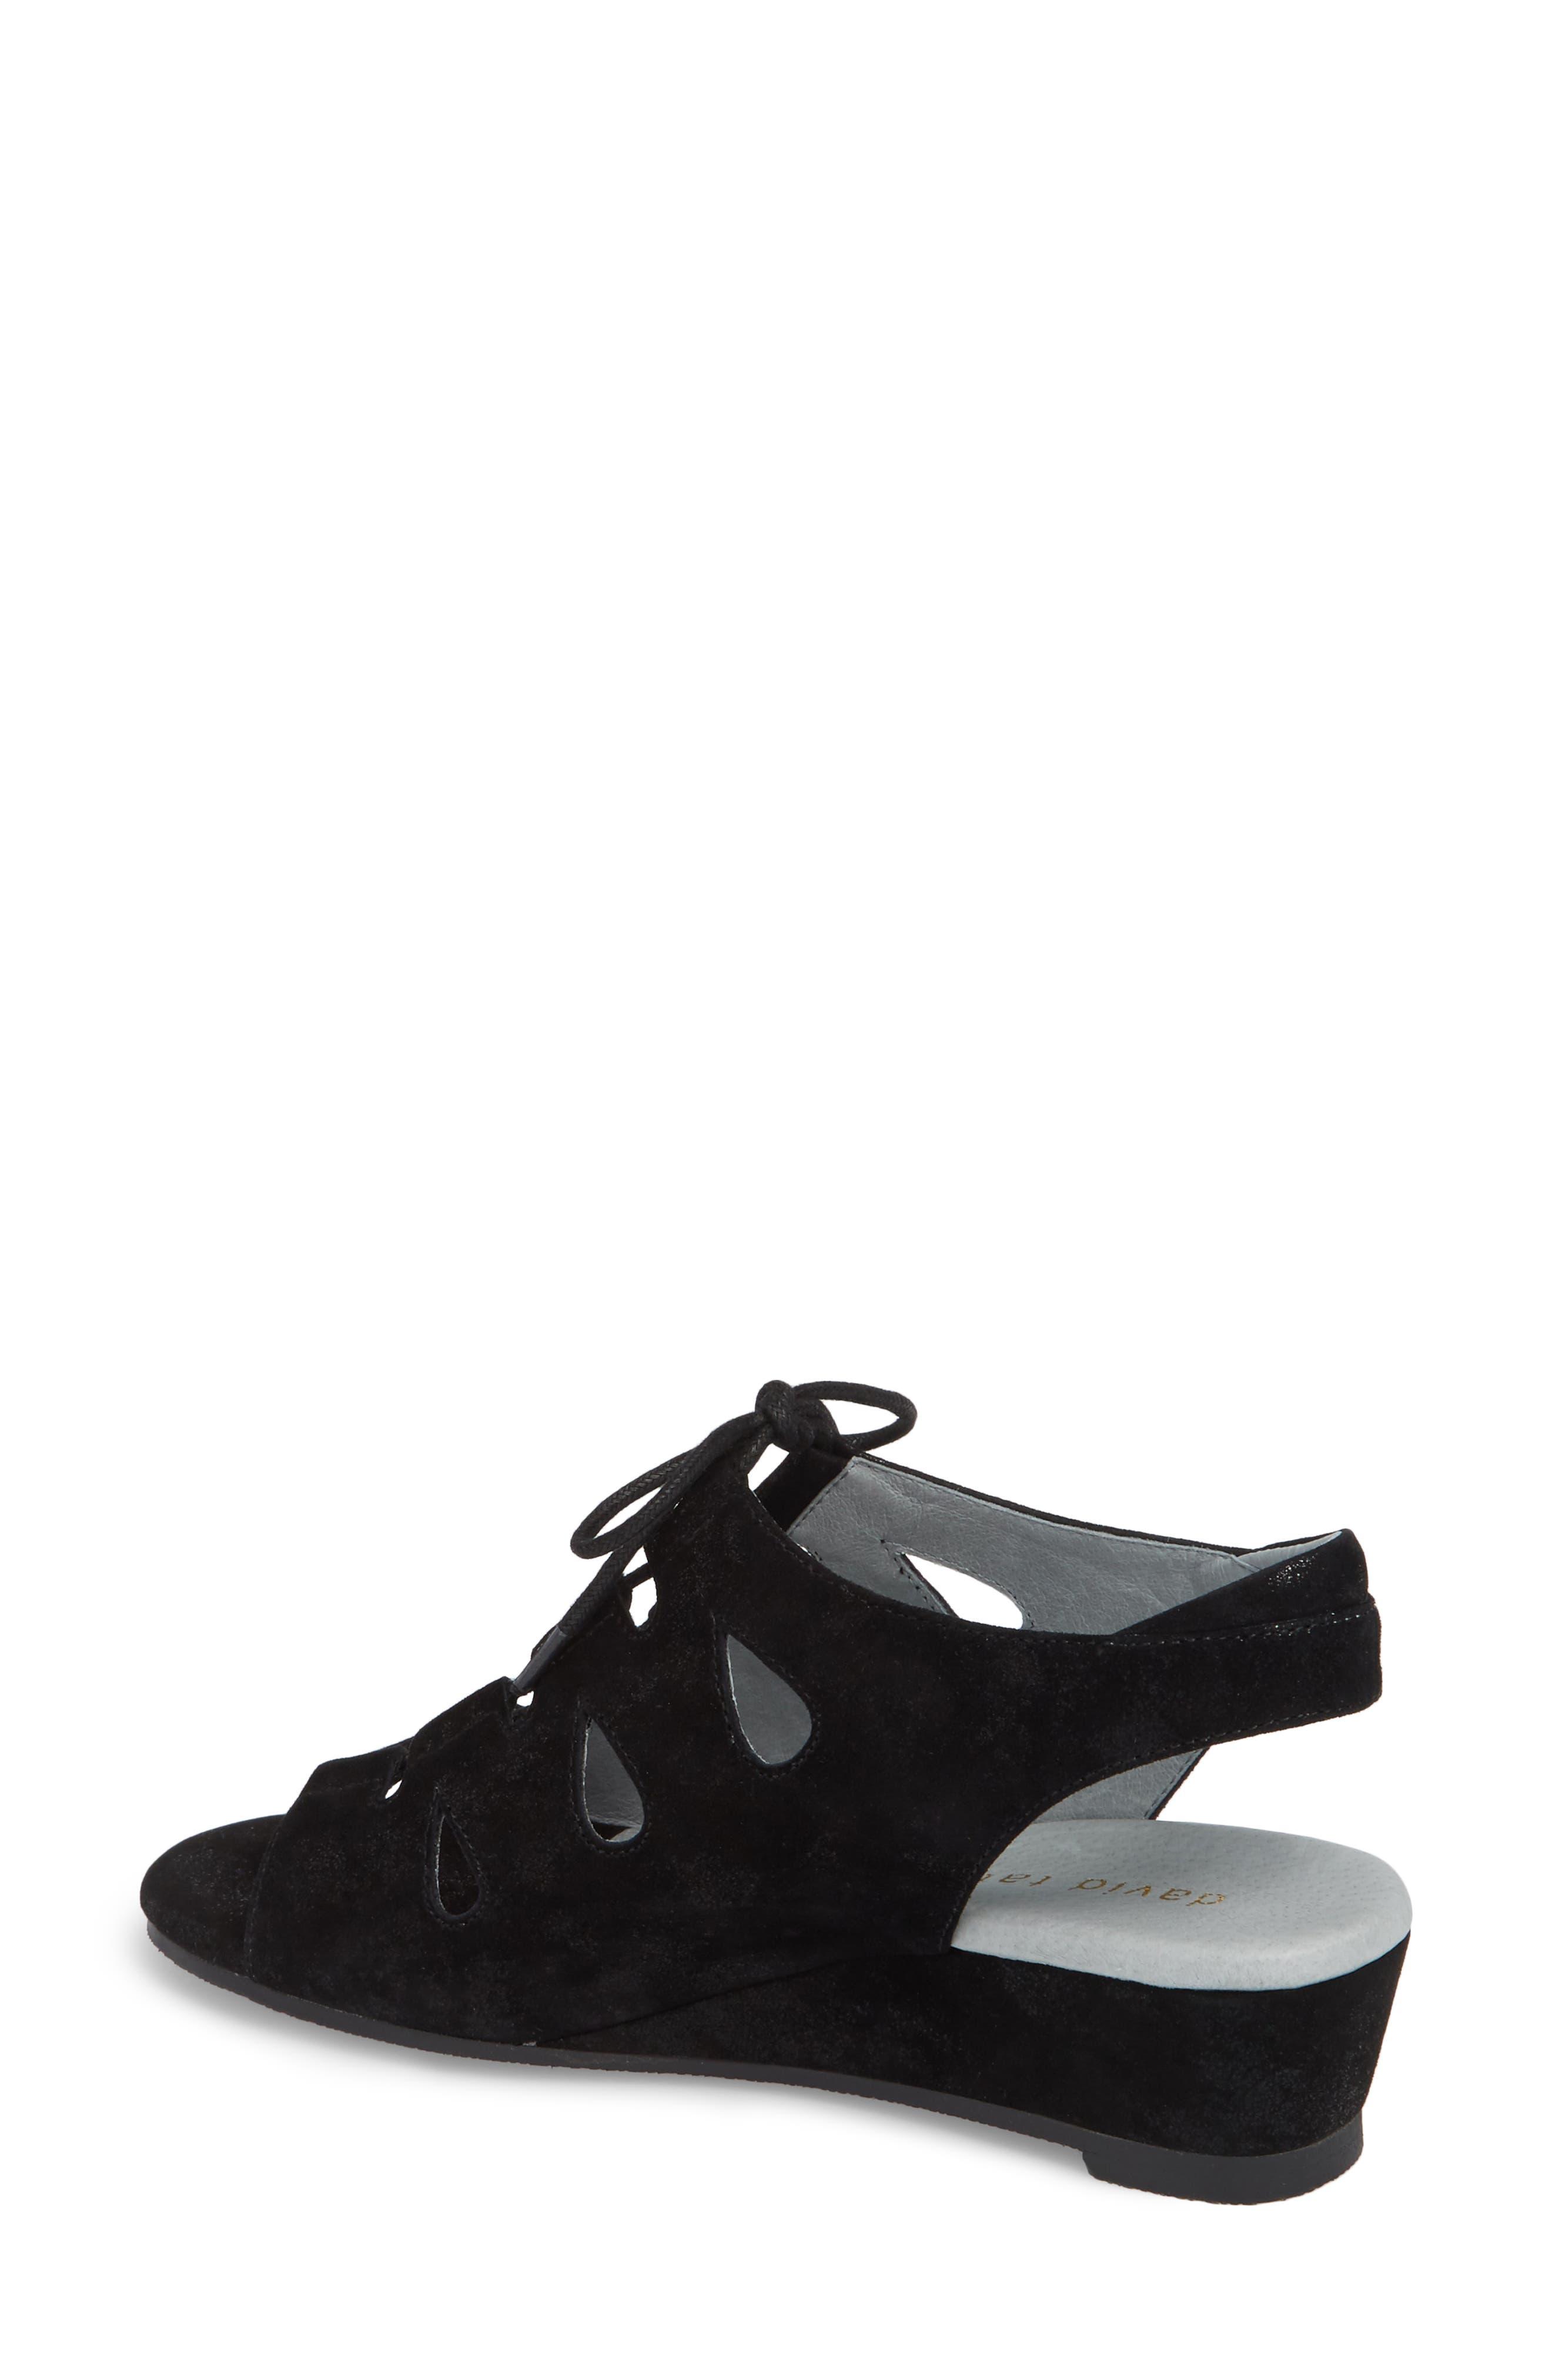 Rich Wedge Sandal,                             Alternate thumbnail 2, color,                             Black Suede